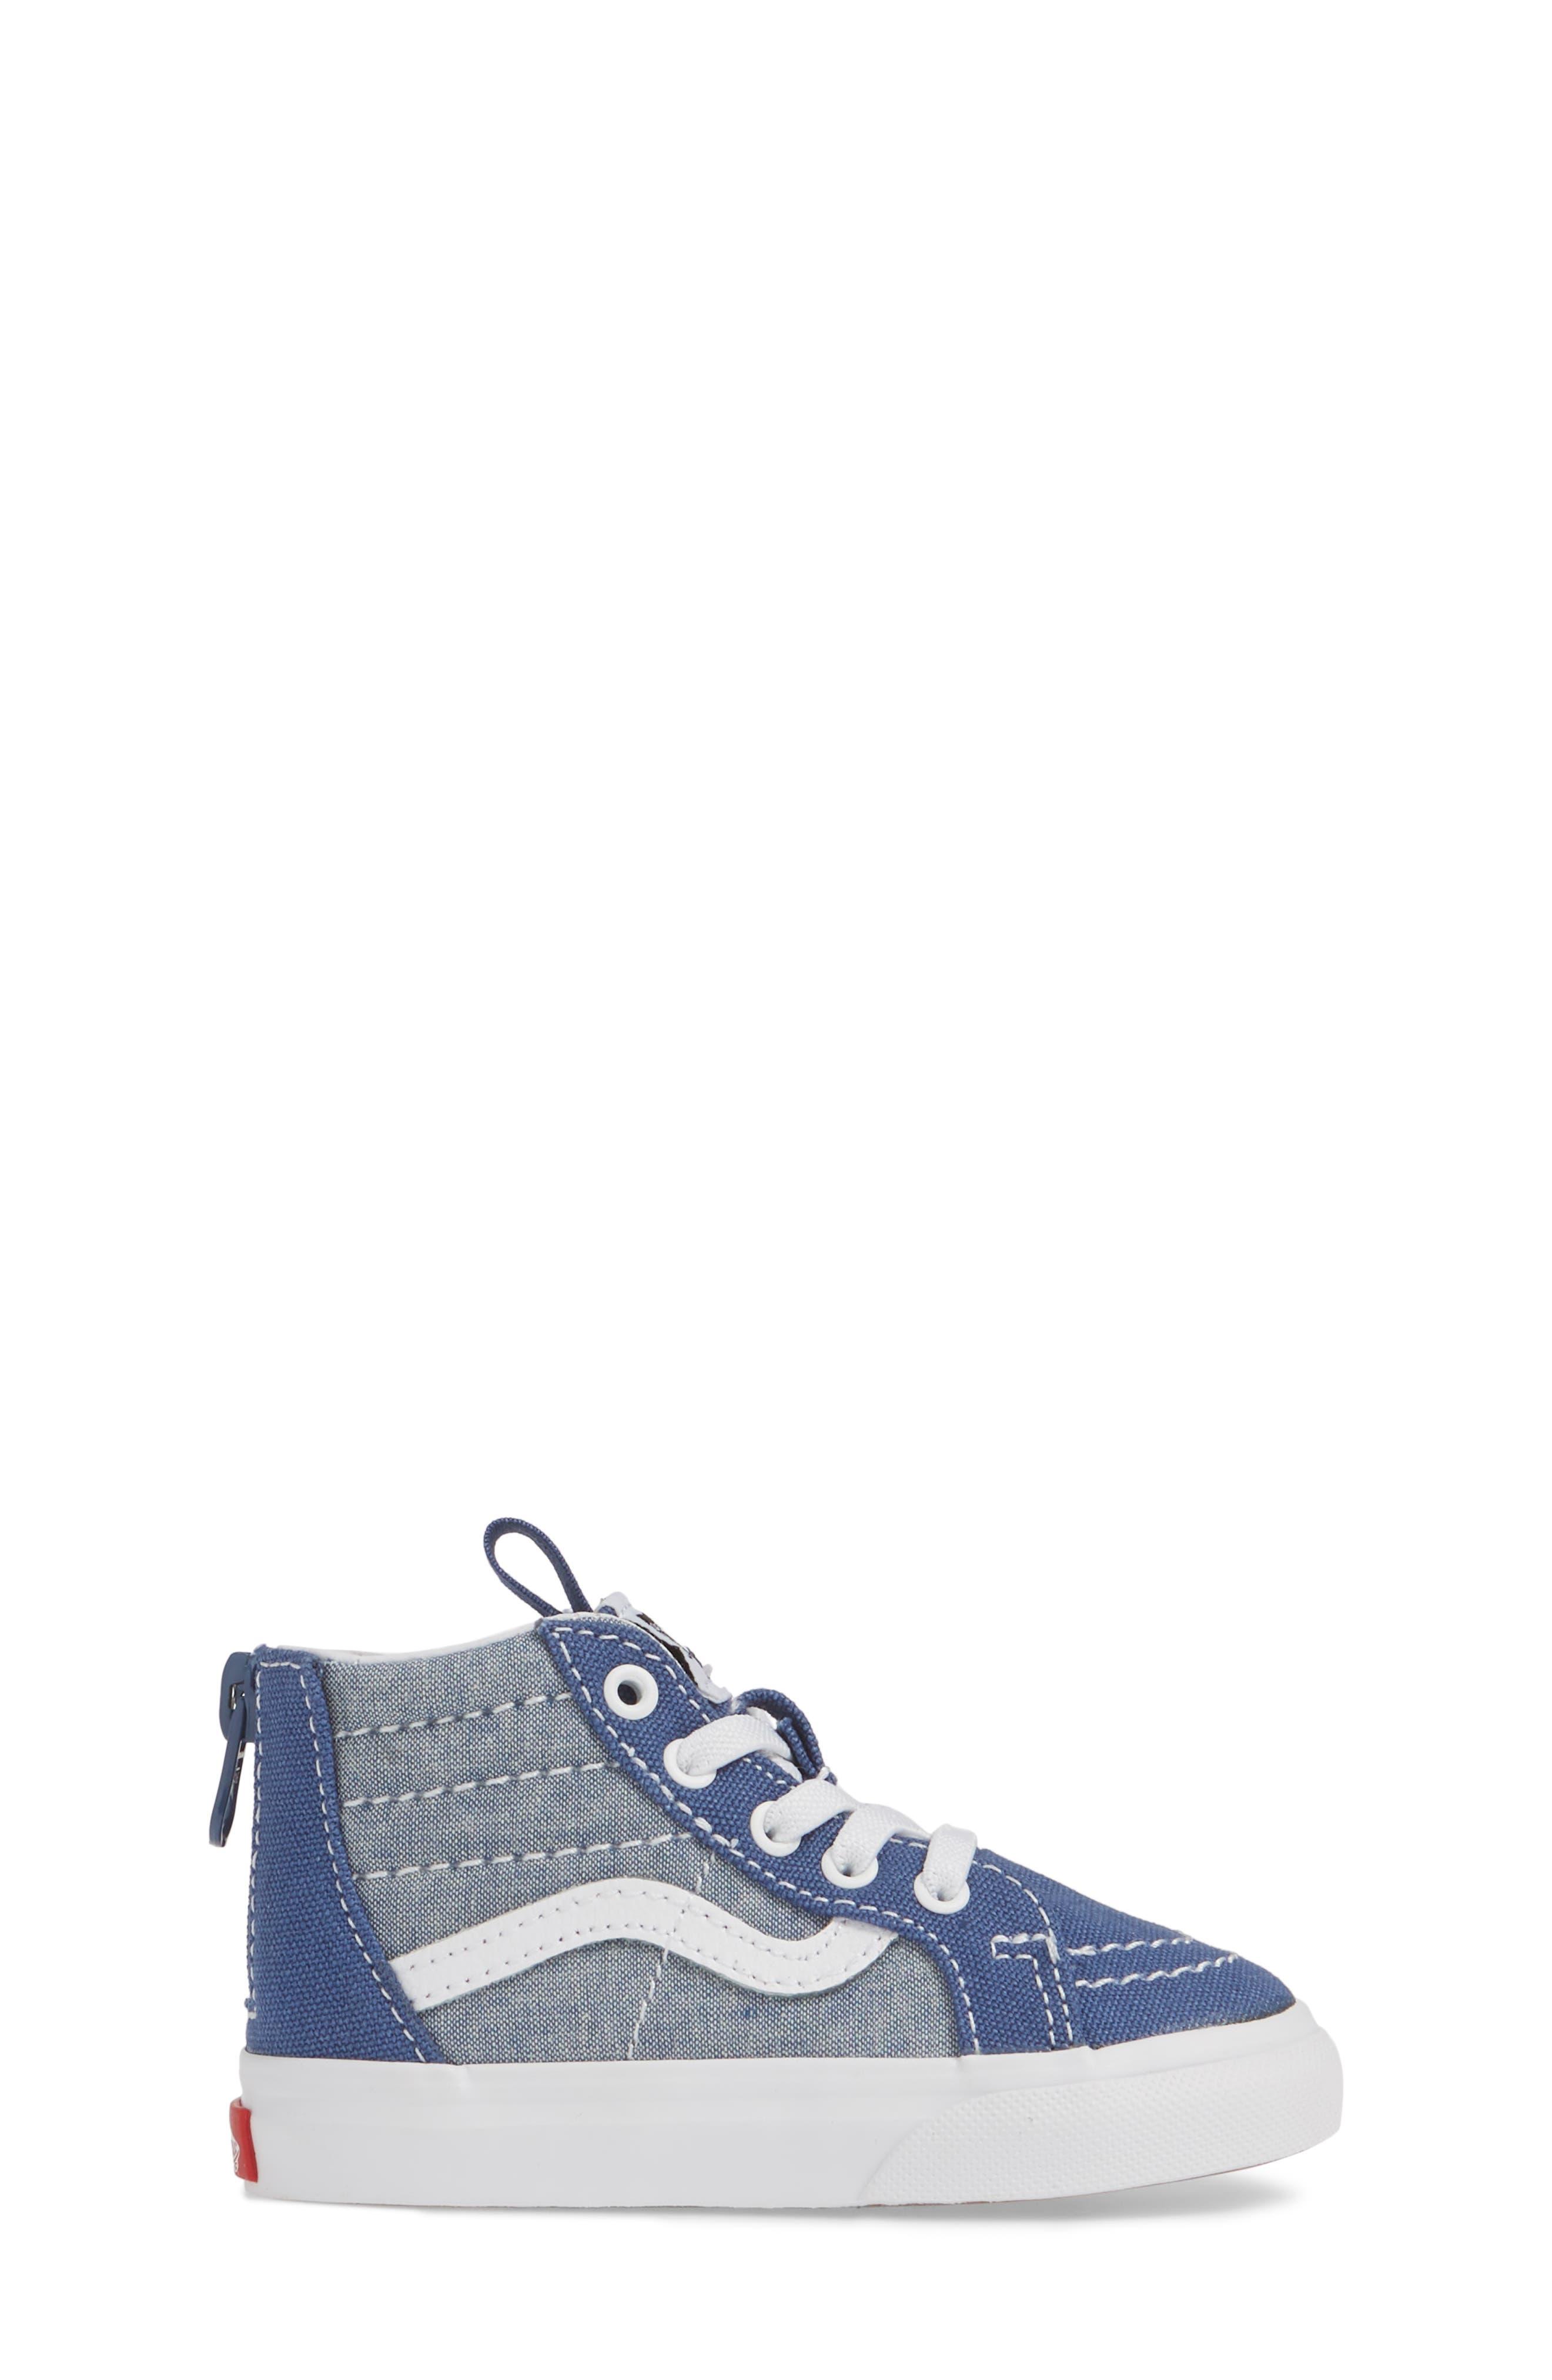 VANS, 'Sk8-Hi' Sneaker, Alternate thumbnail 3, color, CHAMBRAY CANVAS NAVY/ WHITE